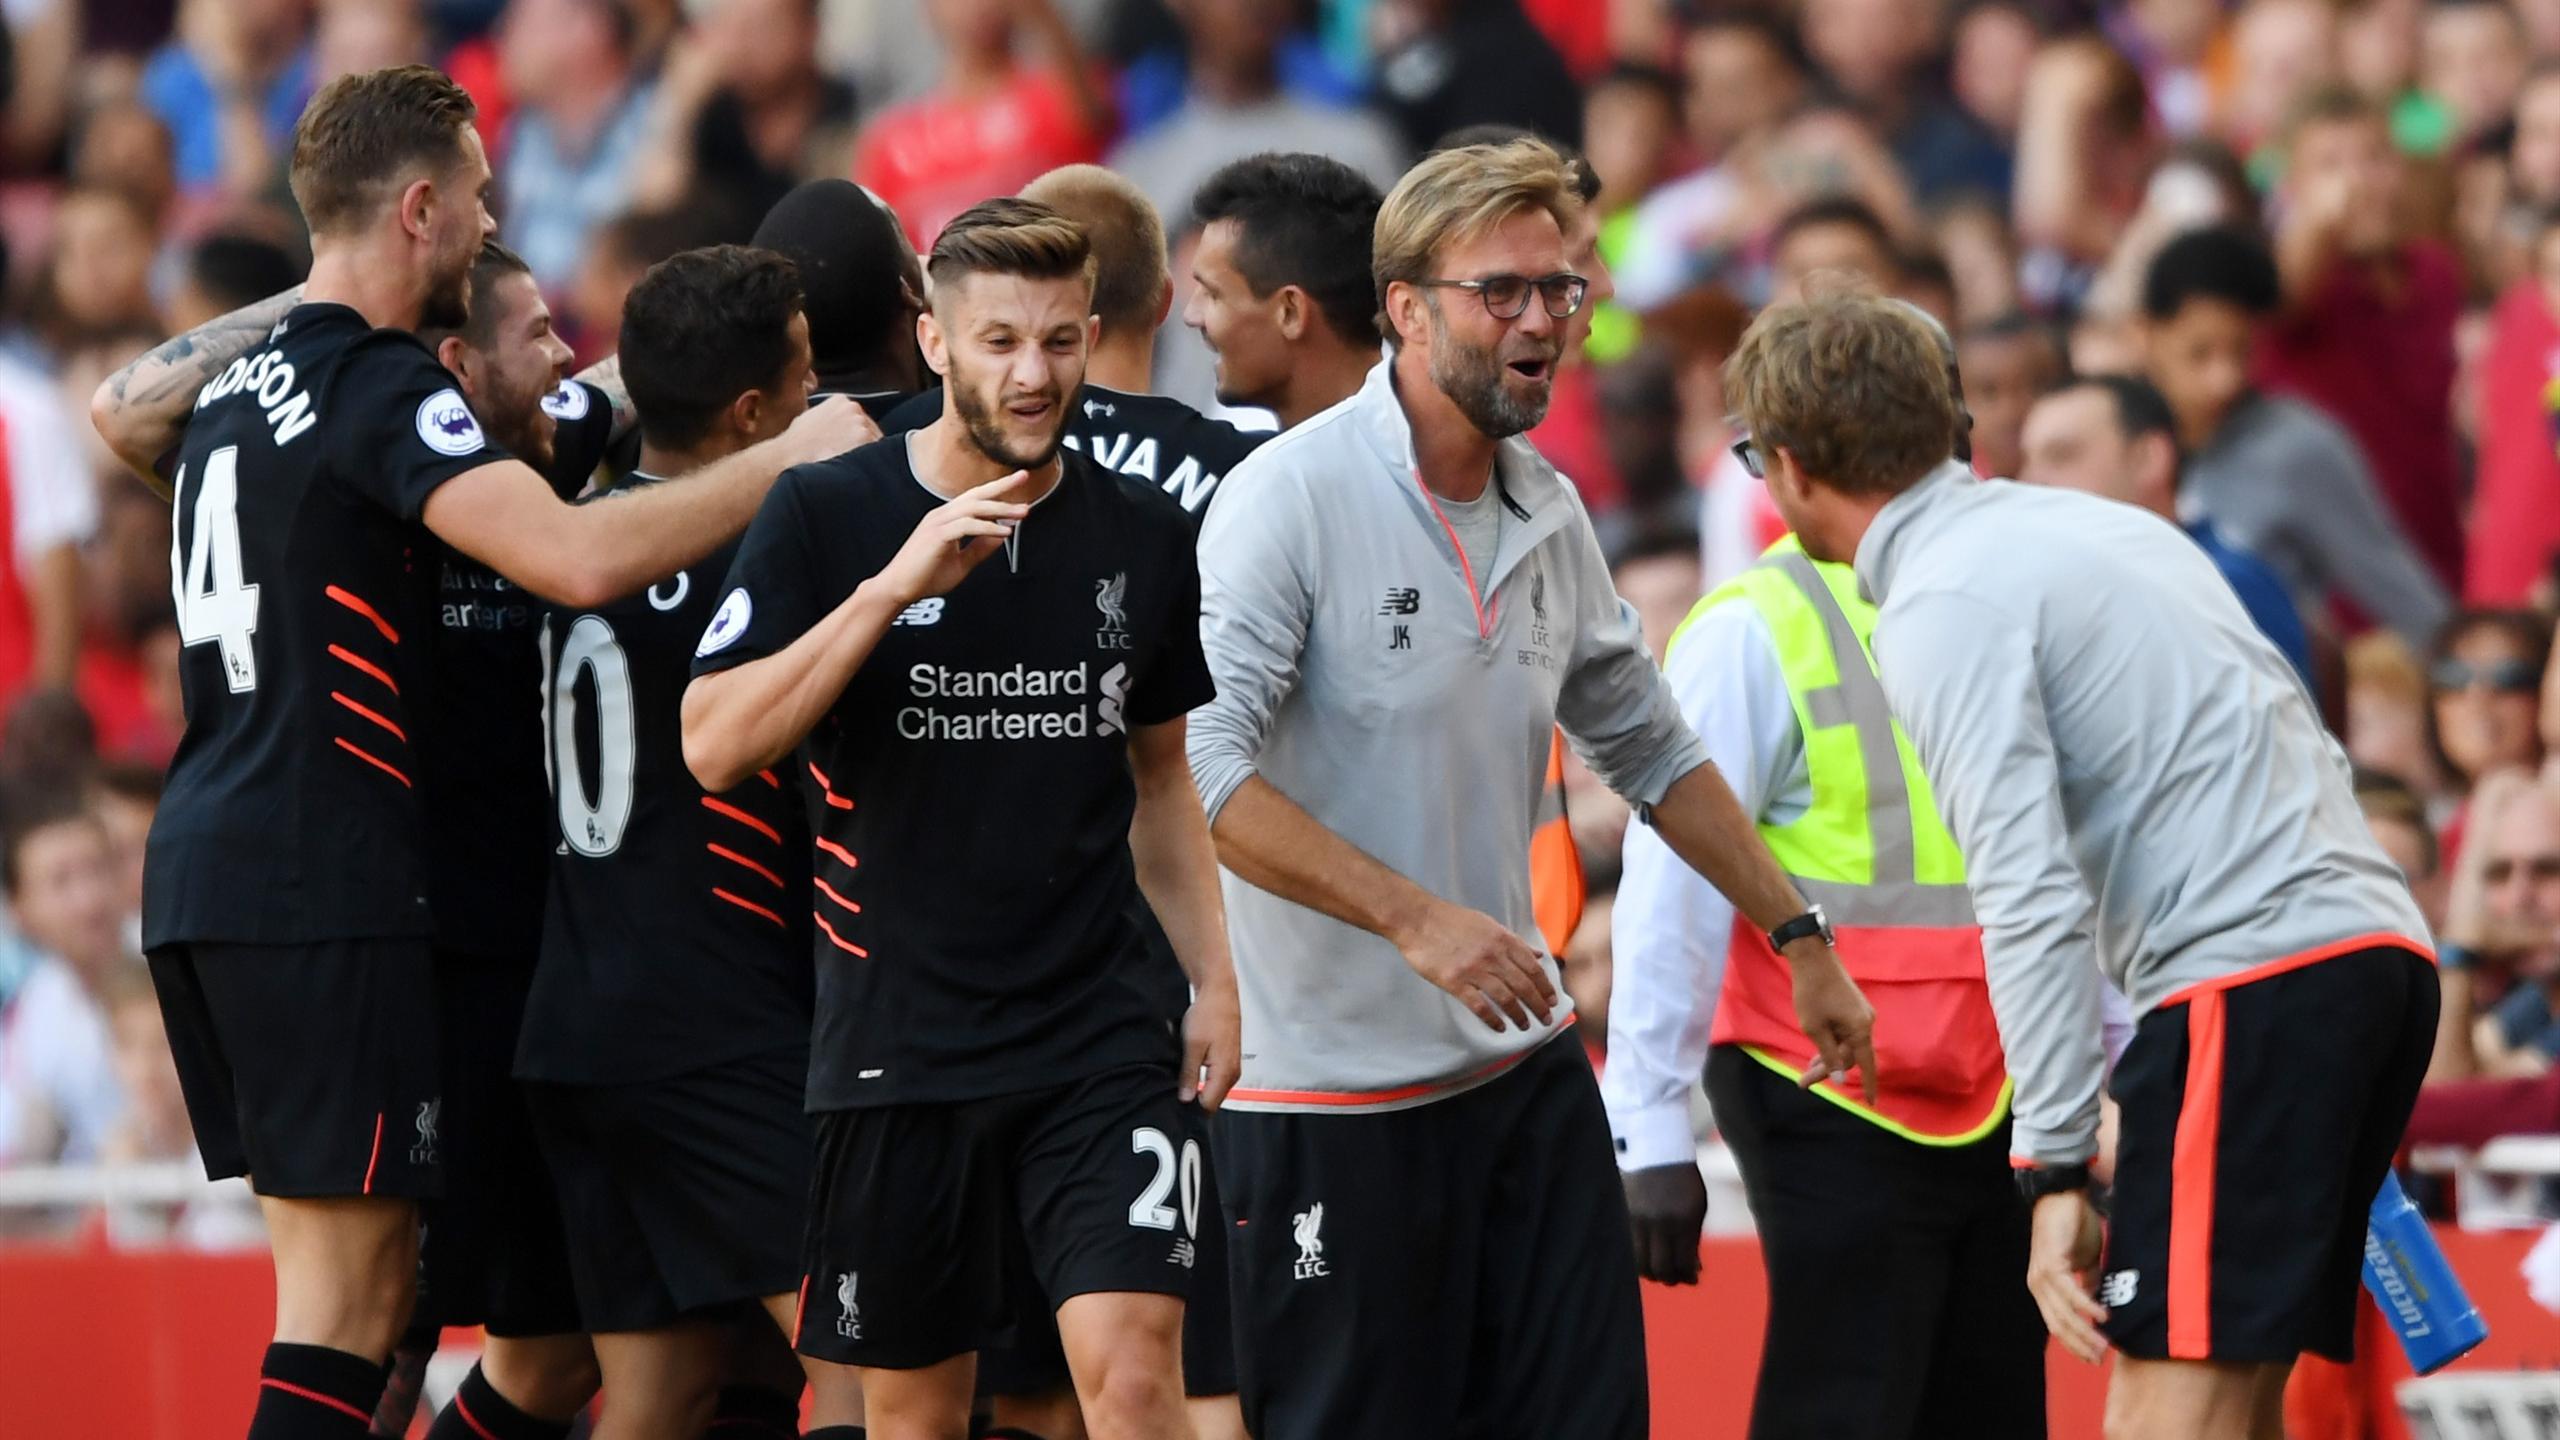 Liverpool's Sadio Mane celebrates scoring their fourth goal with manager Juergen Klopp and teammates